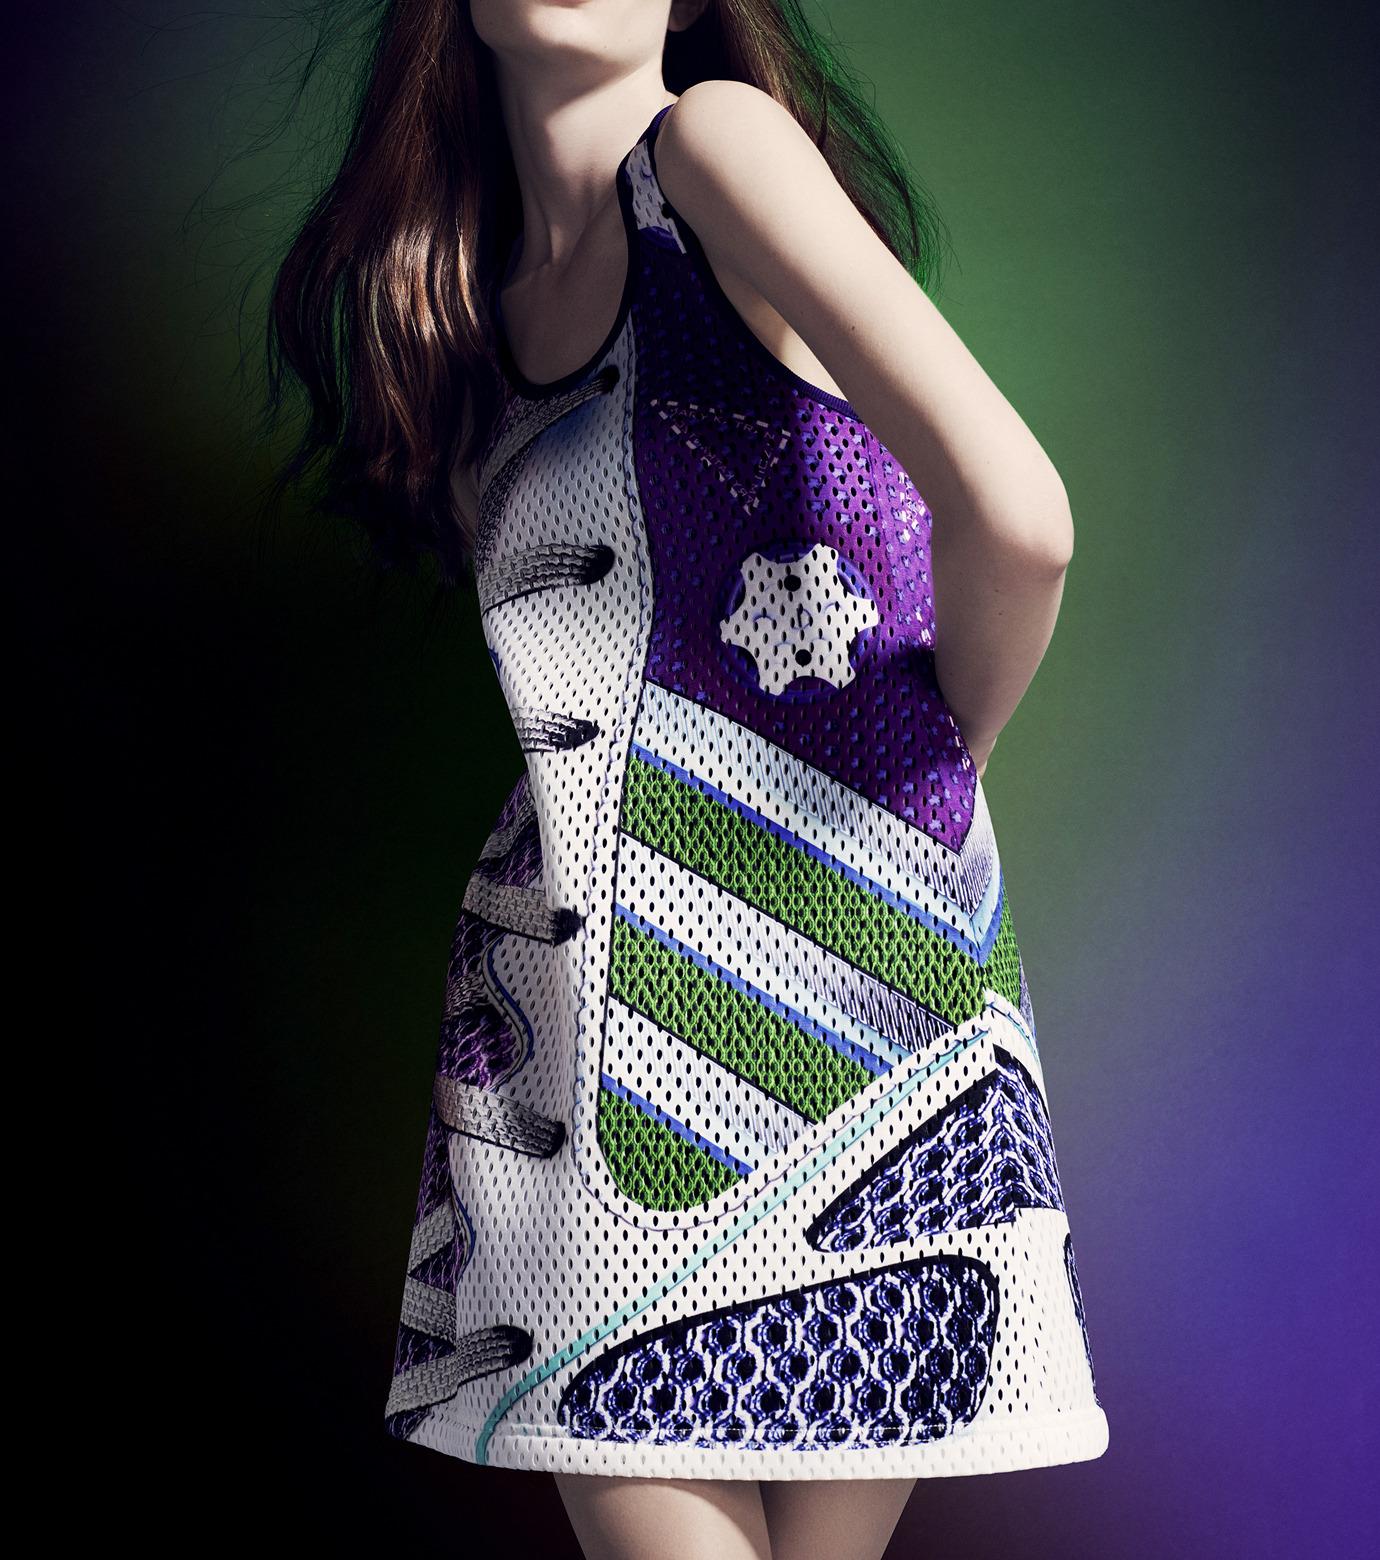 Adidas x Mary Katrantzou(アディダス メアリー・カトランズ)のTank Dress-PURPLE(ドレス/dress)-M62620-82 拡大詳細画像2